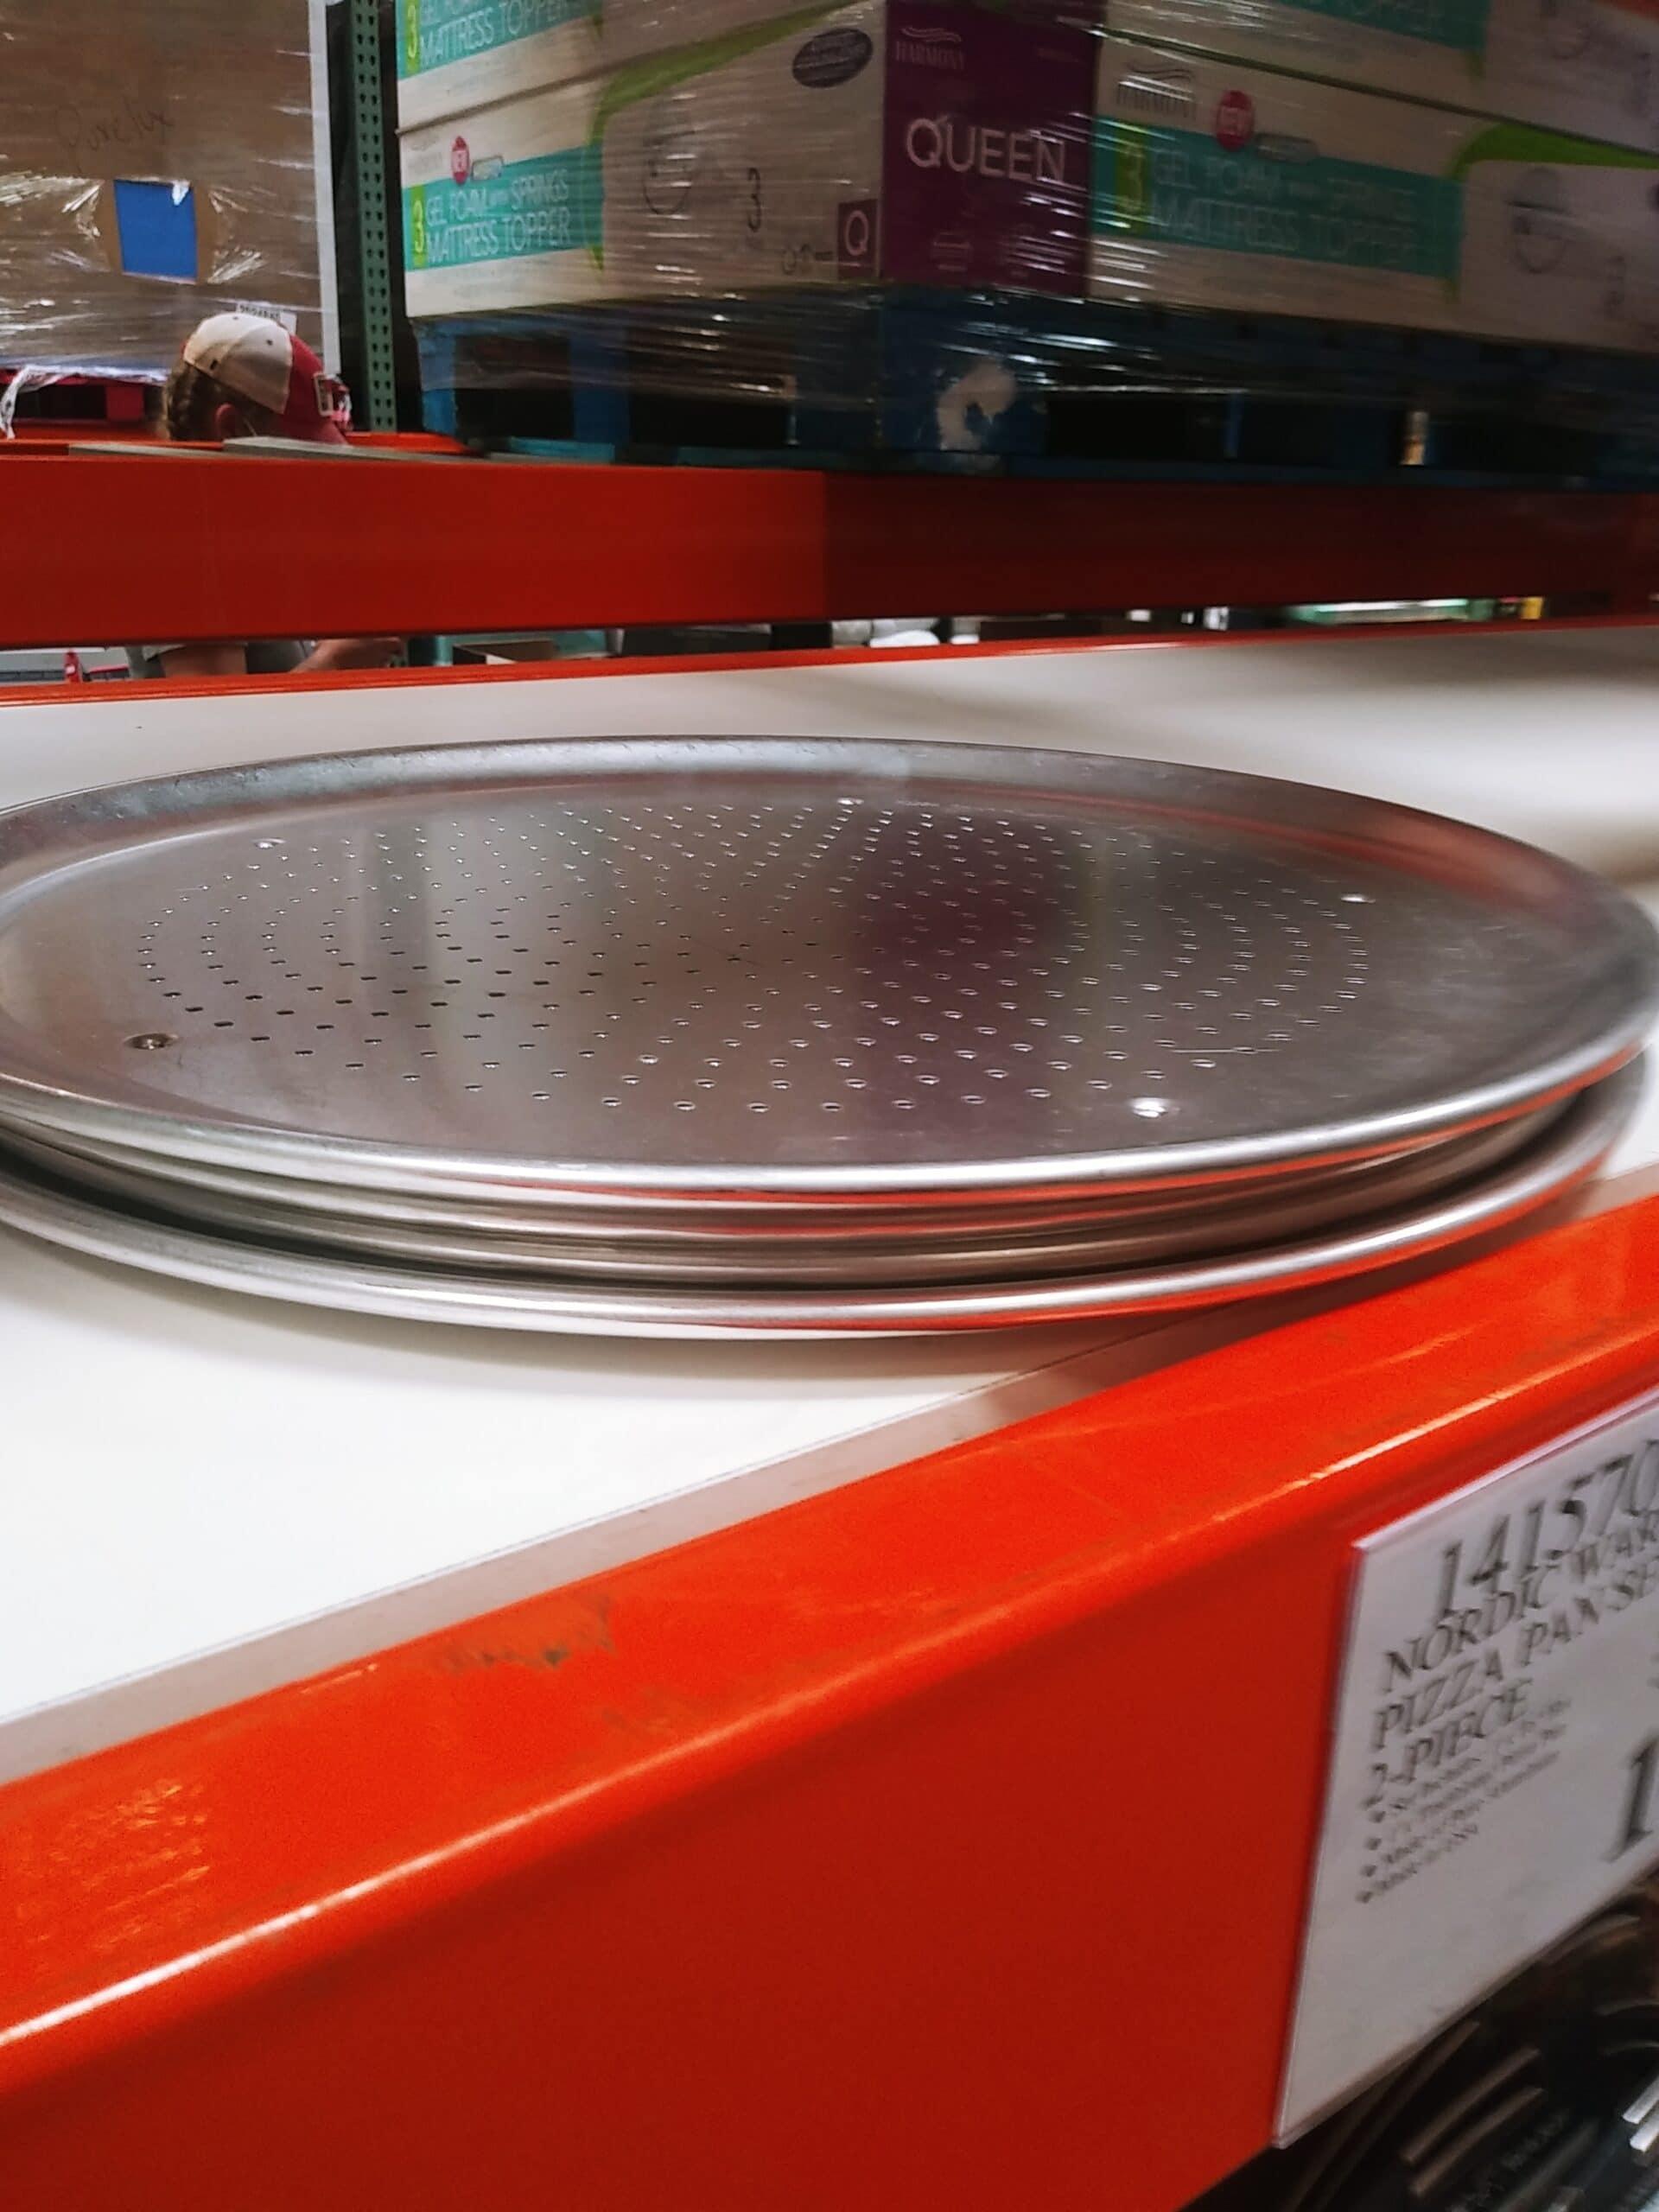 Nordic Ware Pizza Pan Set $14.97